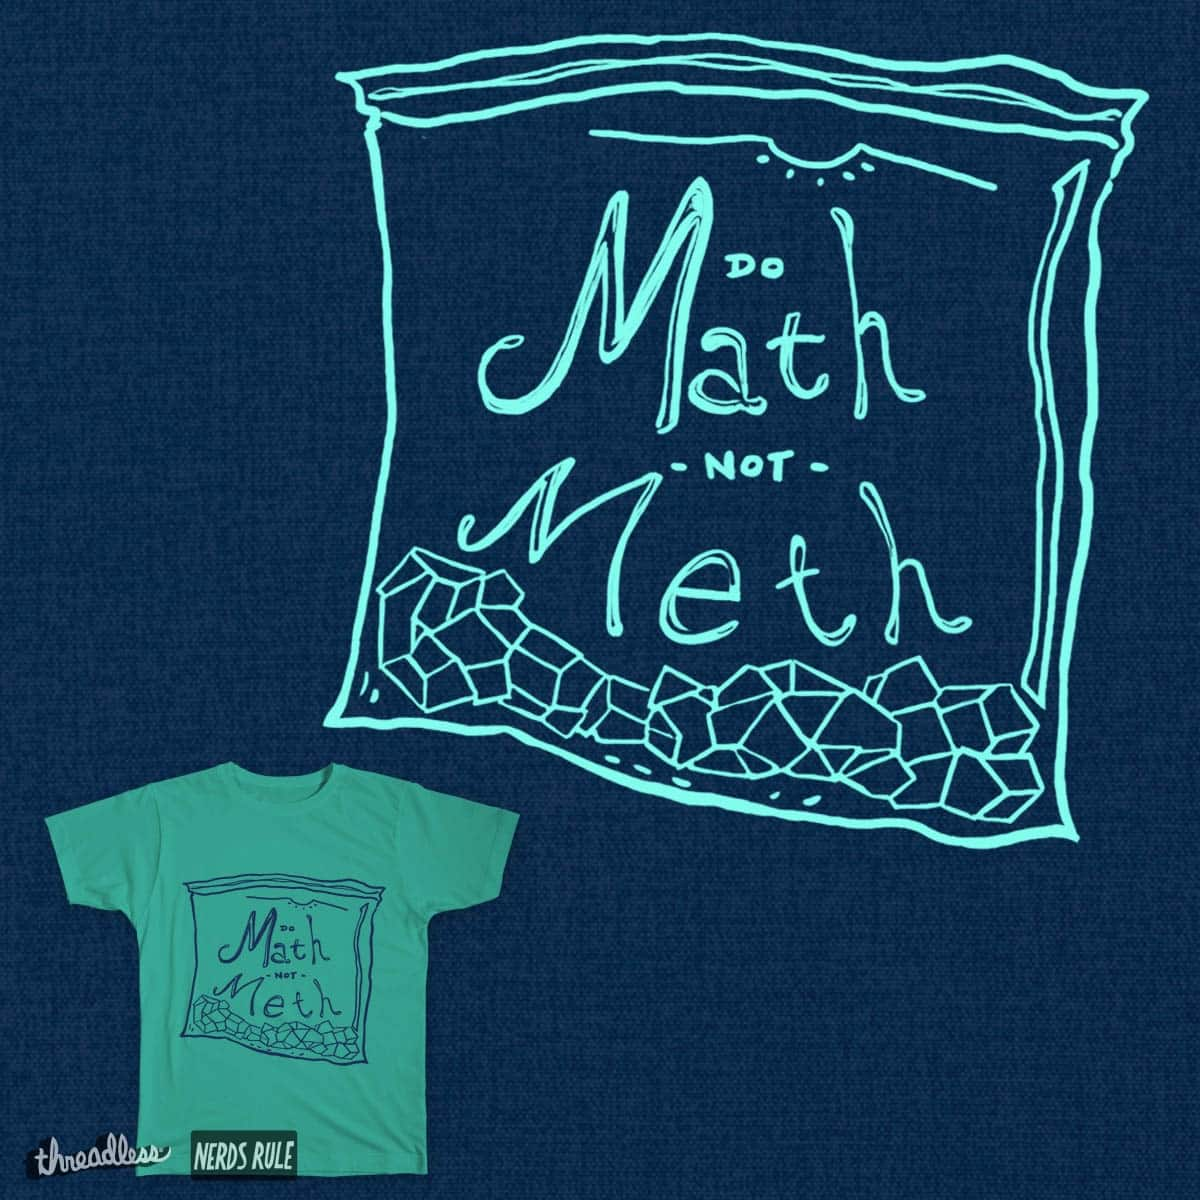 Score Do Math not Meth! by GeraniumAtWork on Threadless